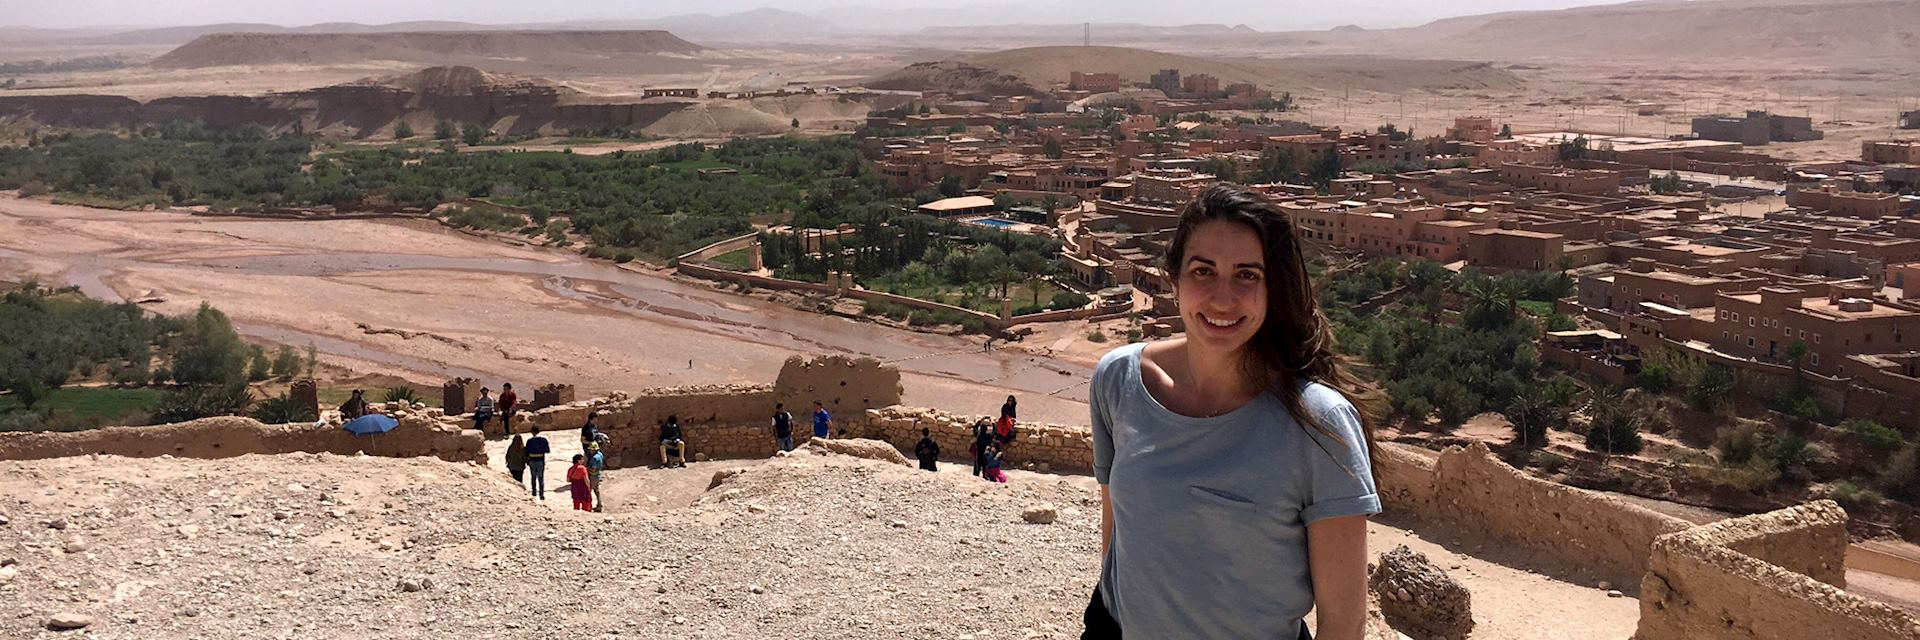 Amira at Ait Ben Haddou, Morocco